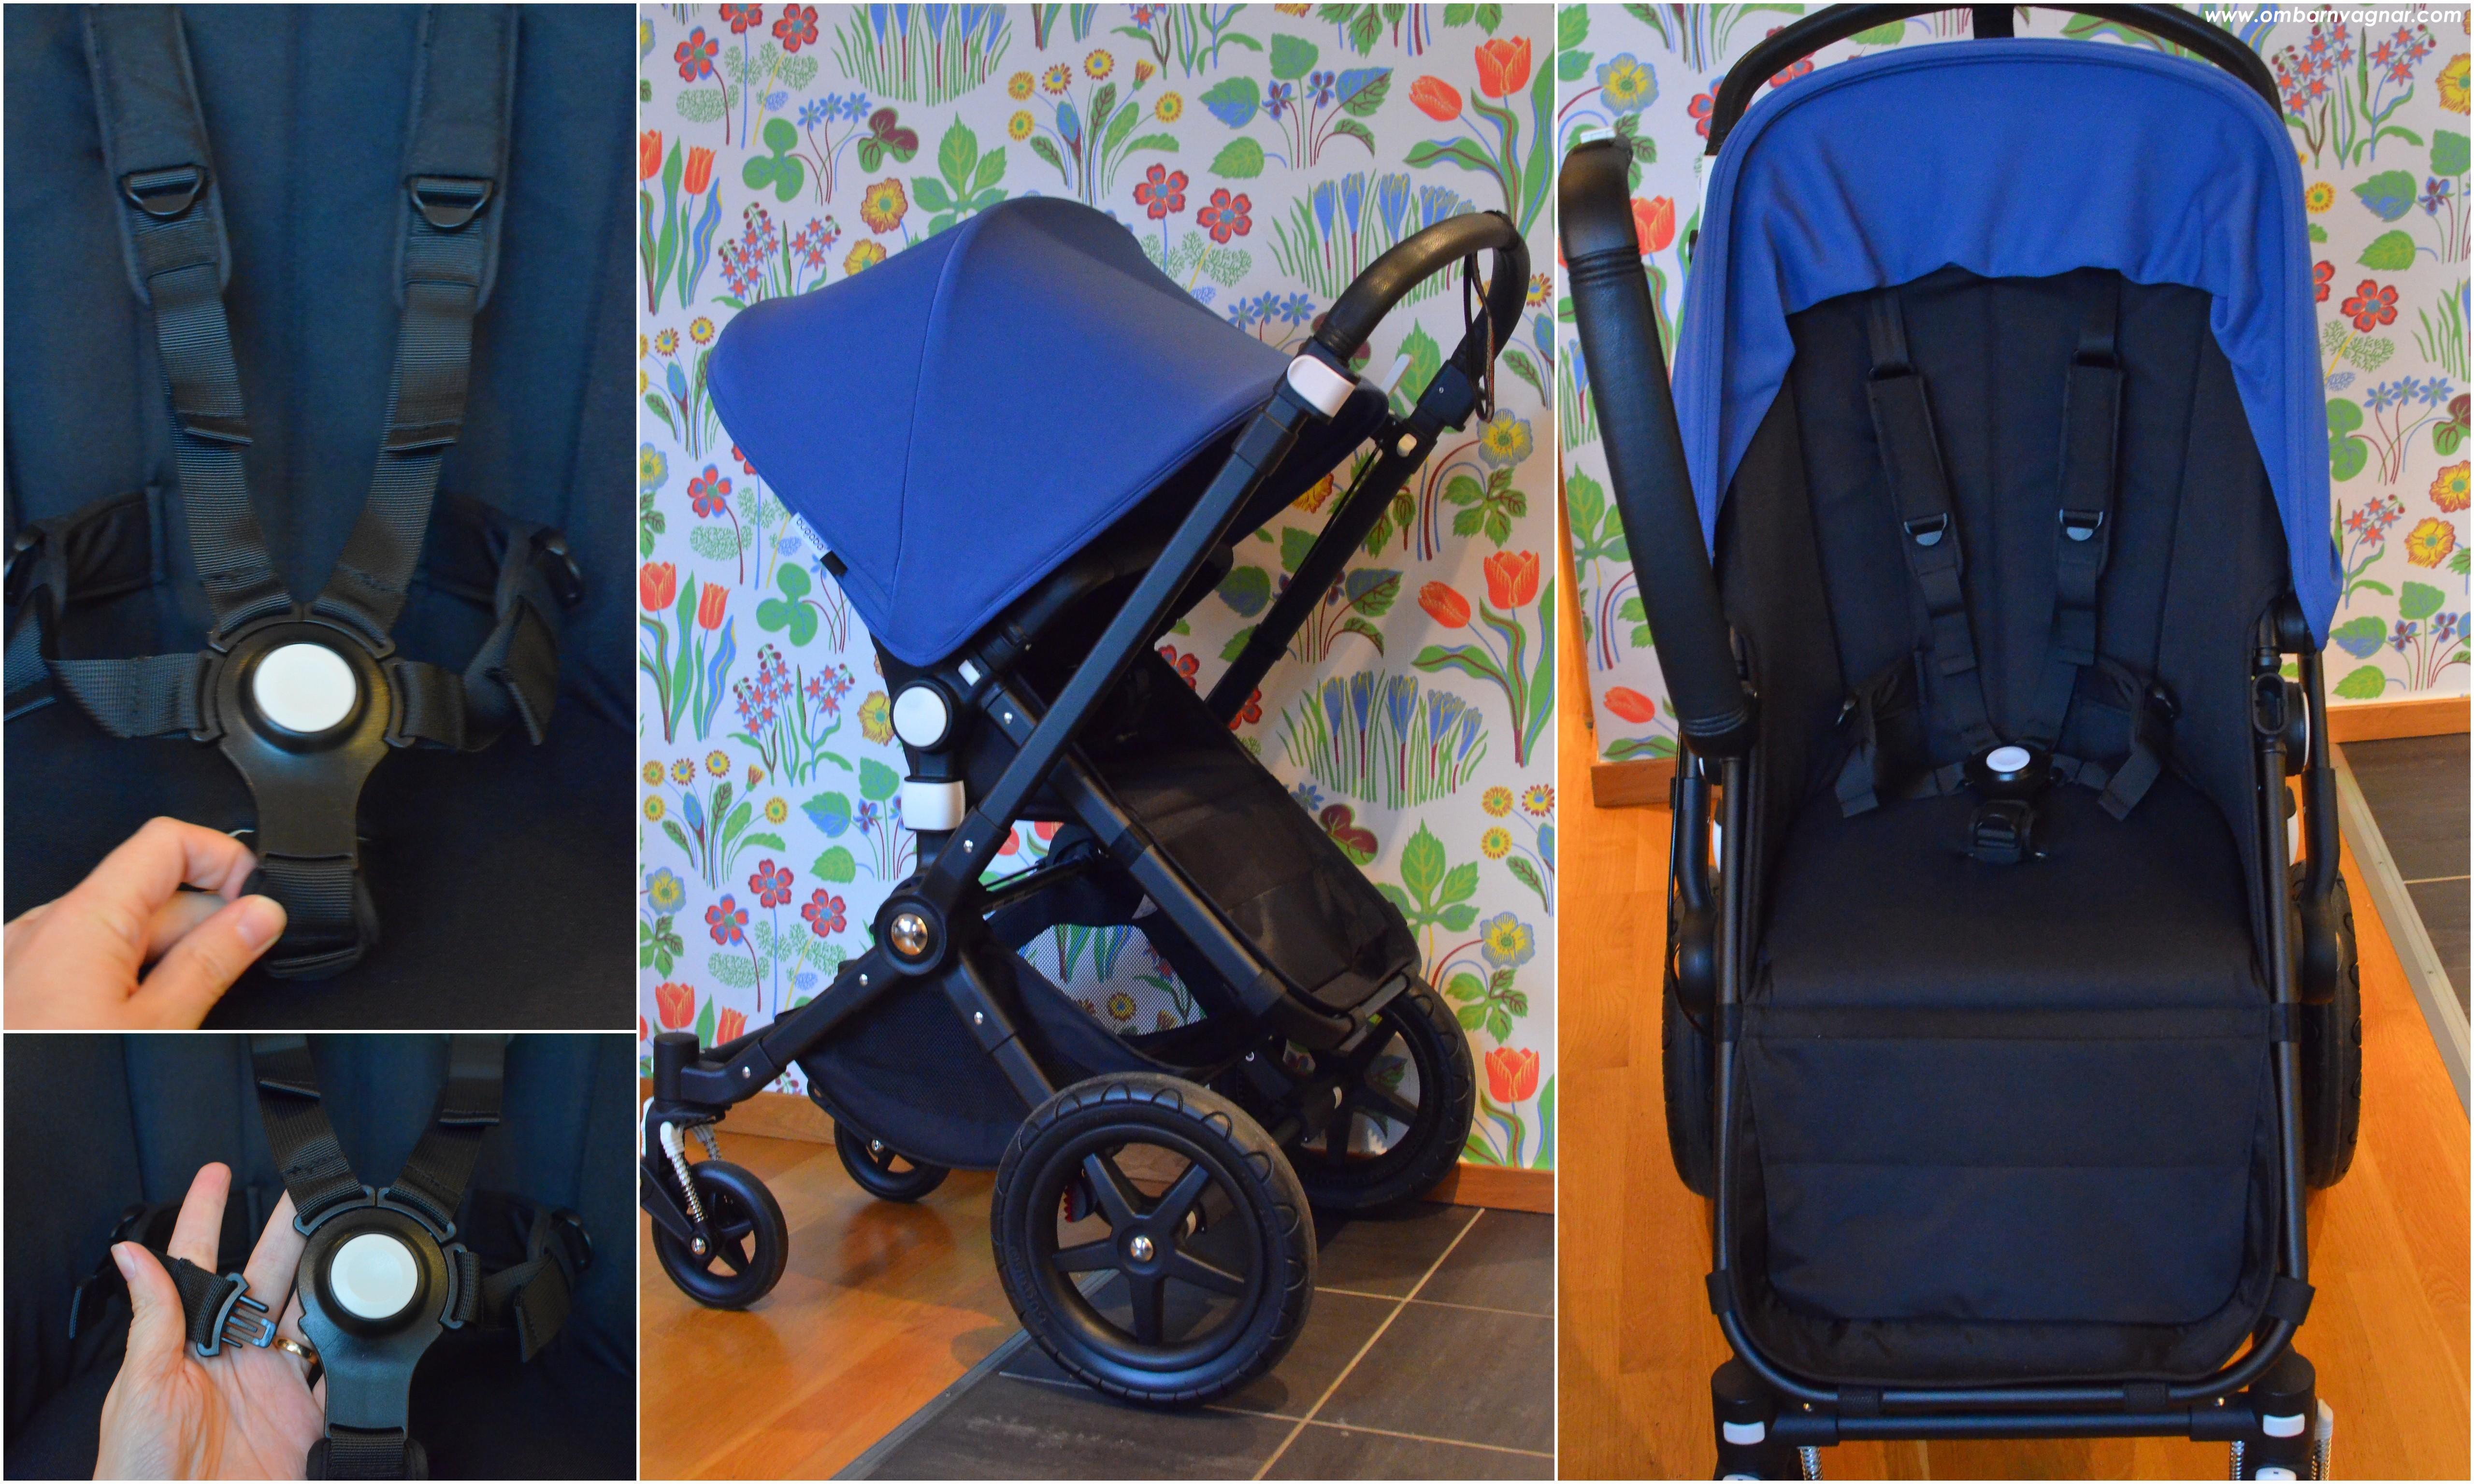 Bugaboo Cameleon3 Plus har ergonomisk sittdel och en smart sele med separata remmar